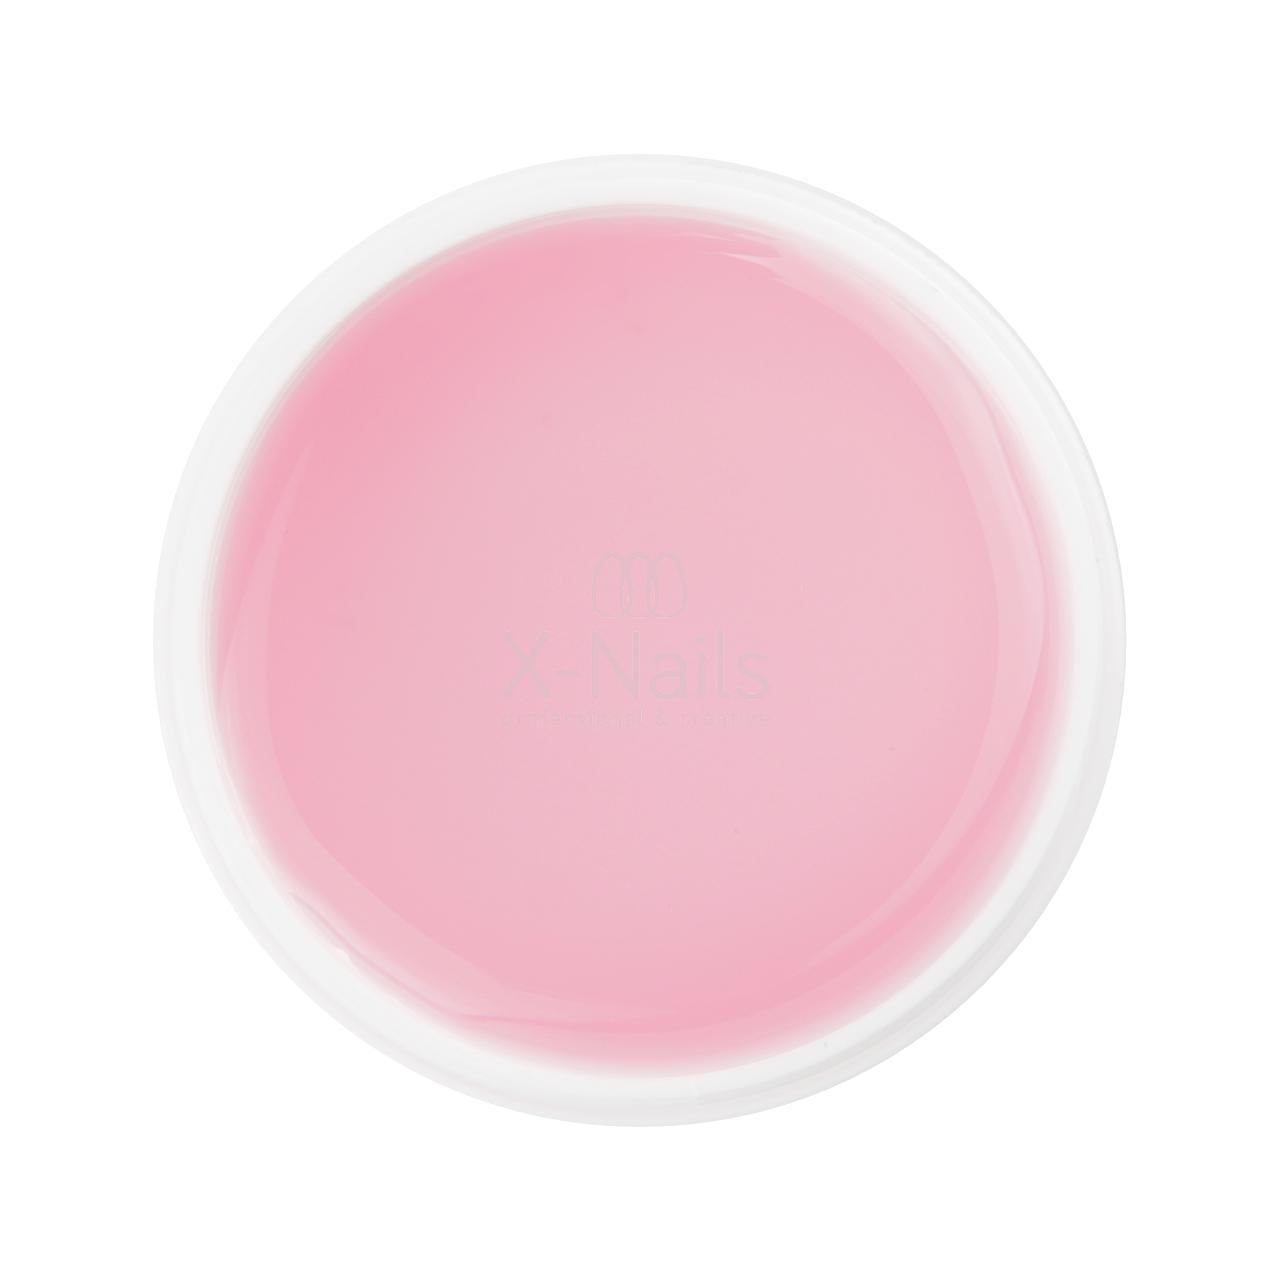 X Nails Stavebni Uv Gel Perfect Line 15 Ml Light Pink Clear Naruzovely X Nails Gelove Akrylove Nehty